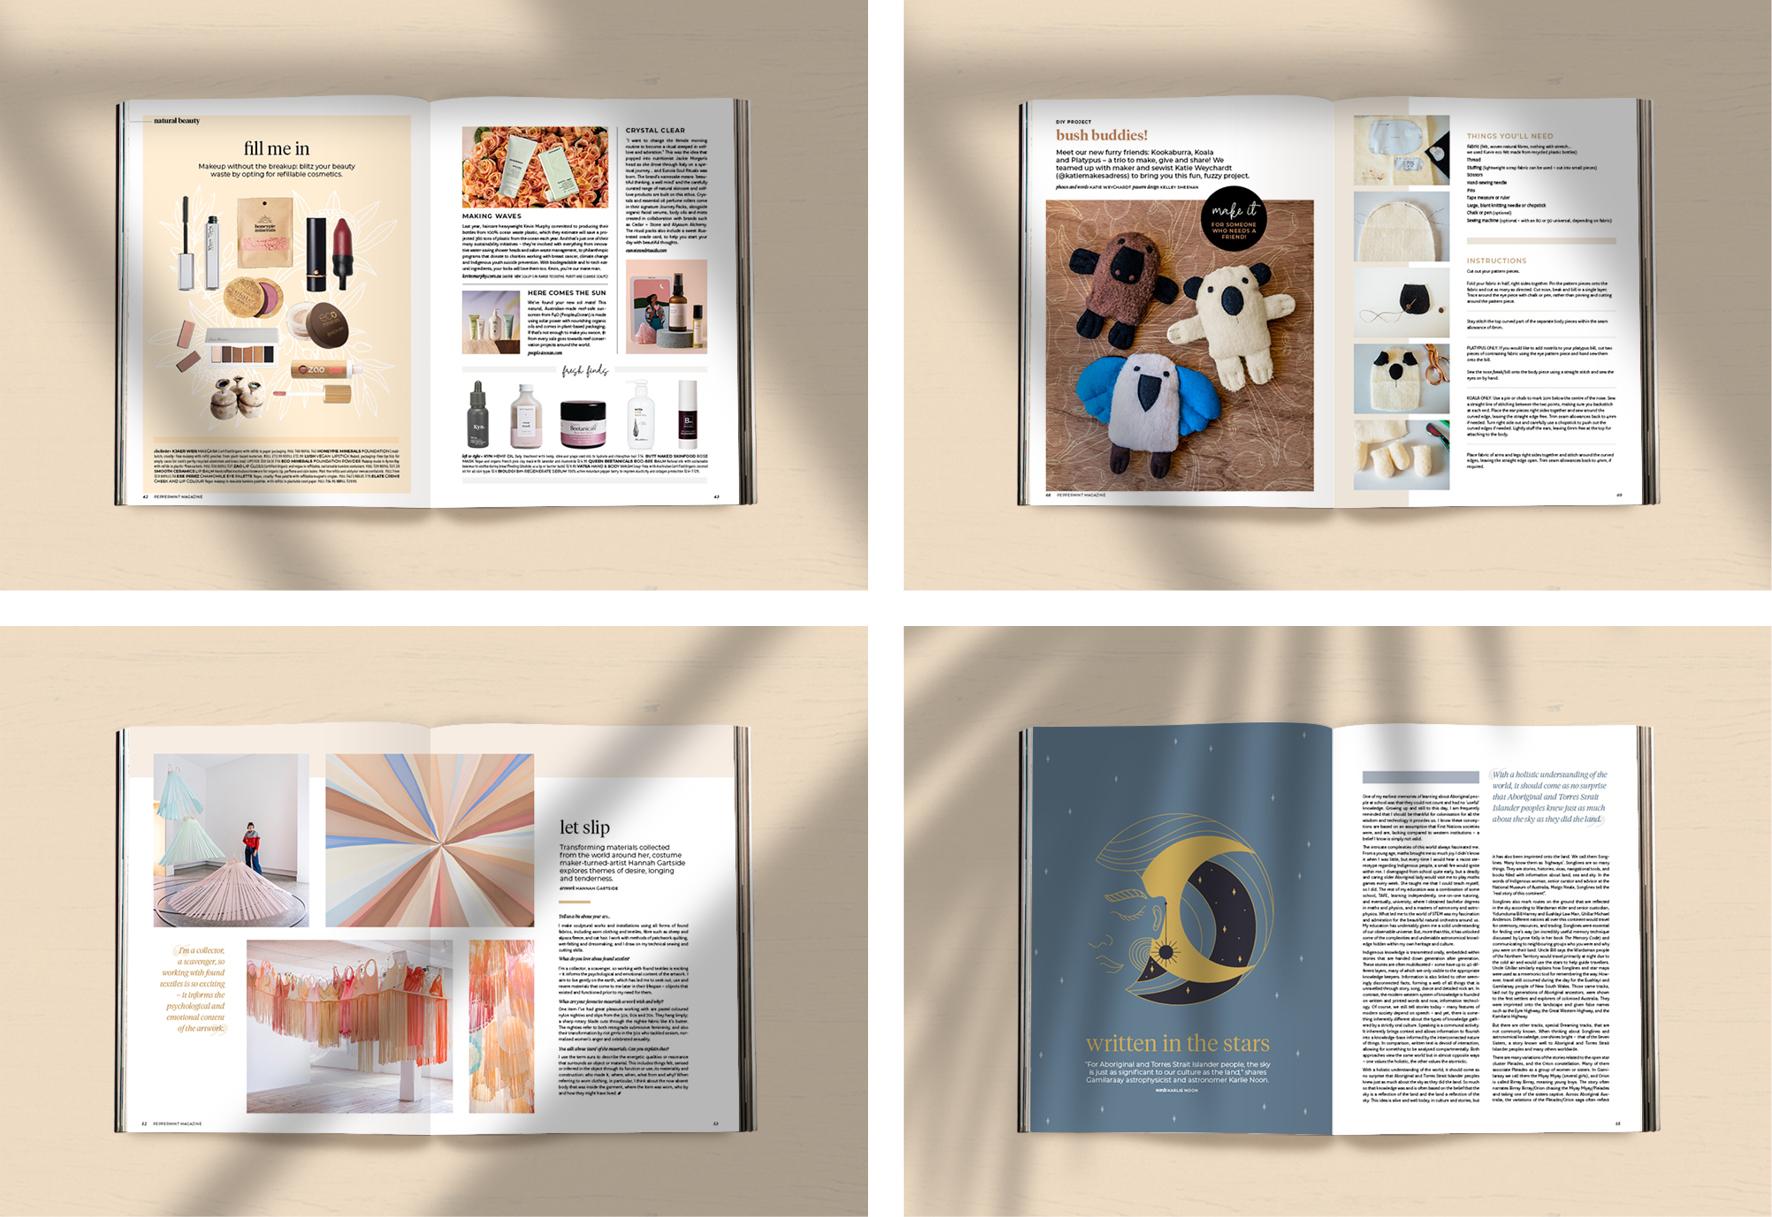 Peppermint magazine – Issue 48 Summer